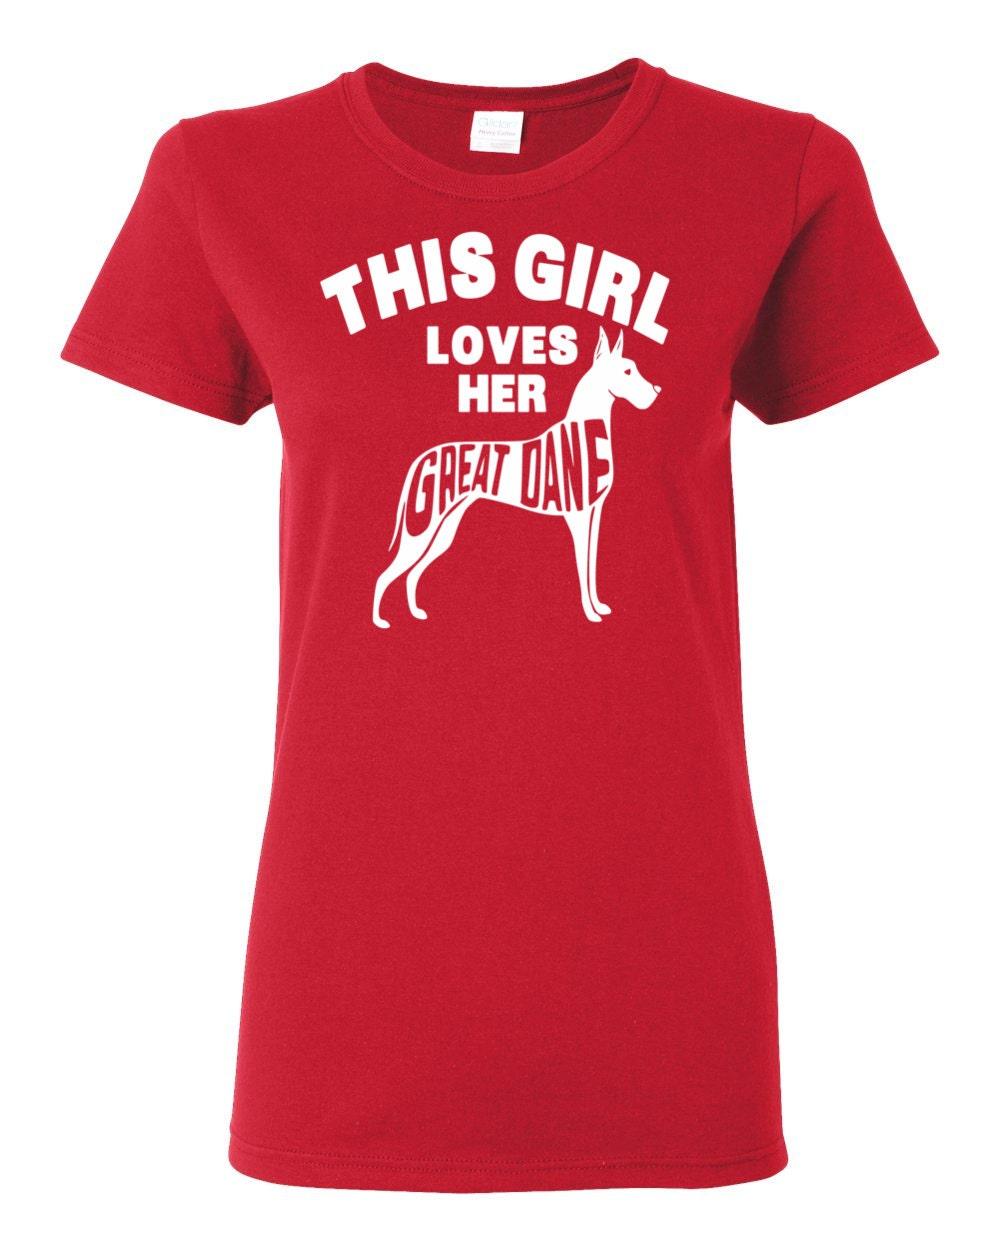 Great Dane T-shirt - This Girl Loves Her Great Dane - My Dog Great Dane Womens T-shirt